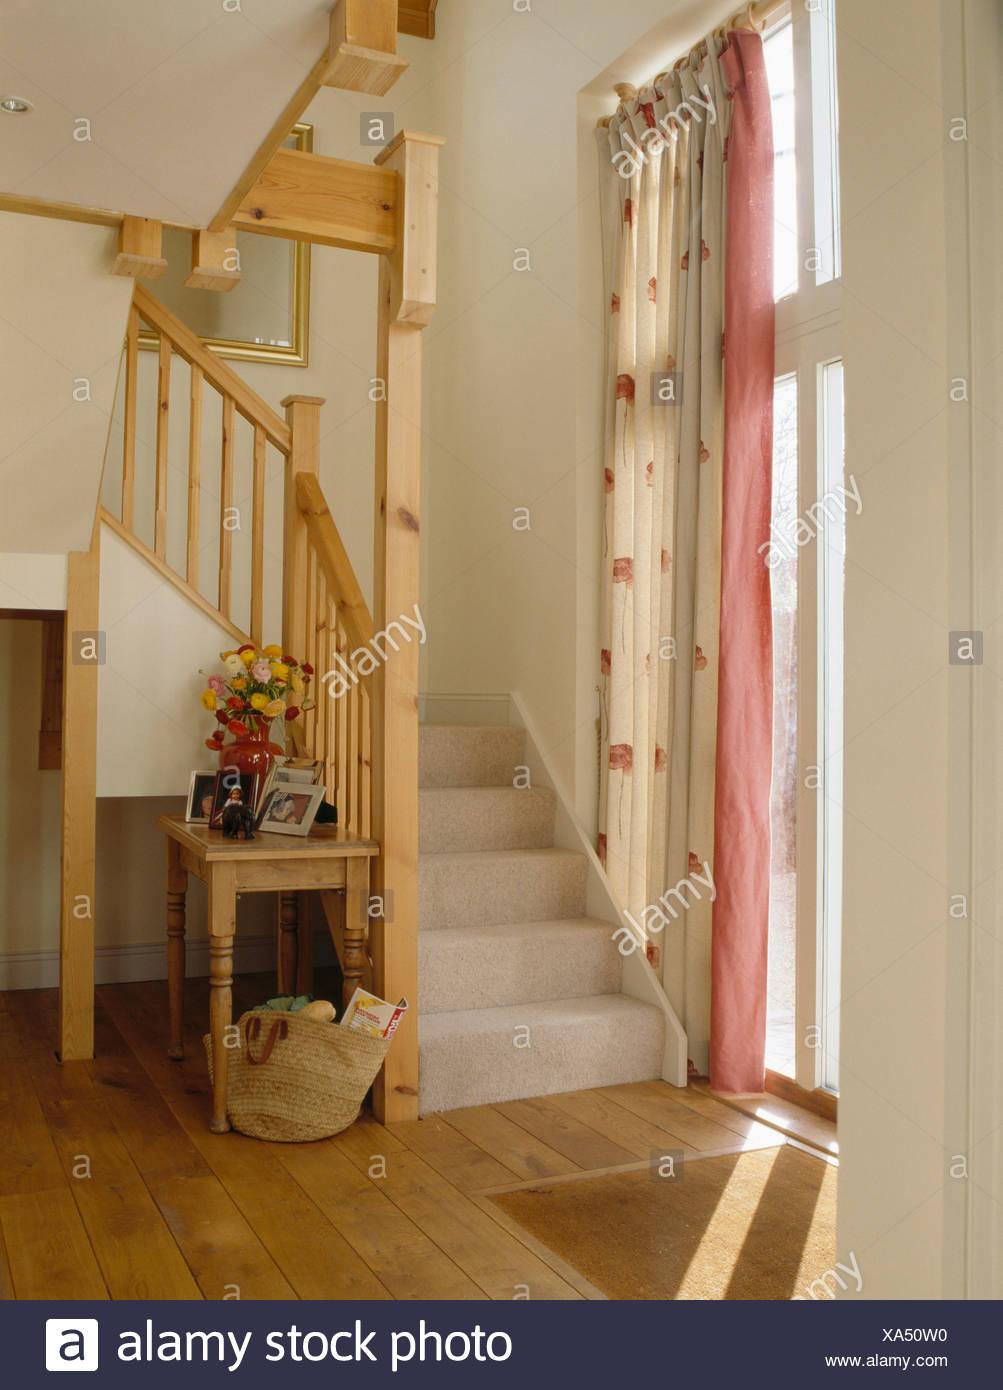 cremefarbene teppich auf offene holztreppe im wei en saal mit creme rosa gemusterte vorh nge. Black Bedroom Furniture Sets. Home Design Ideas